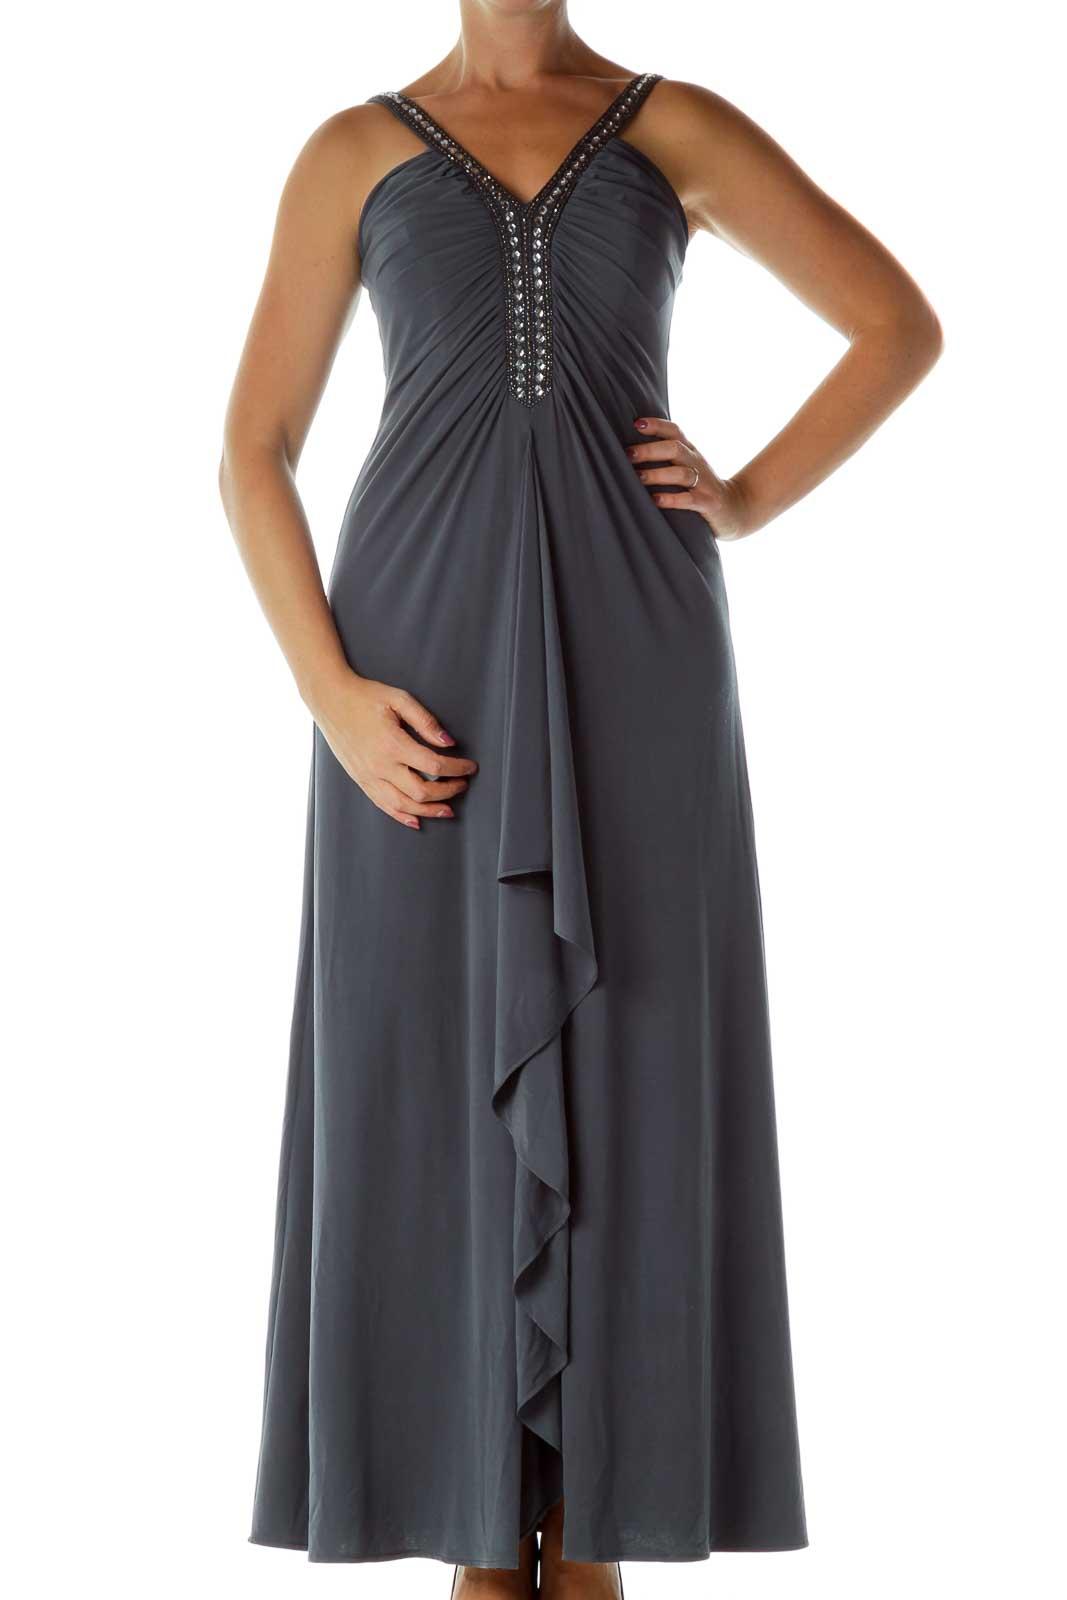 Gray Beaded Evening Dress Front